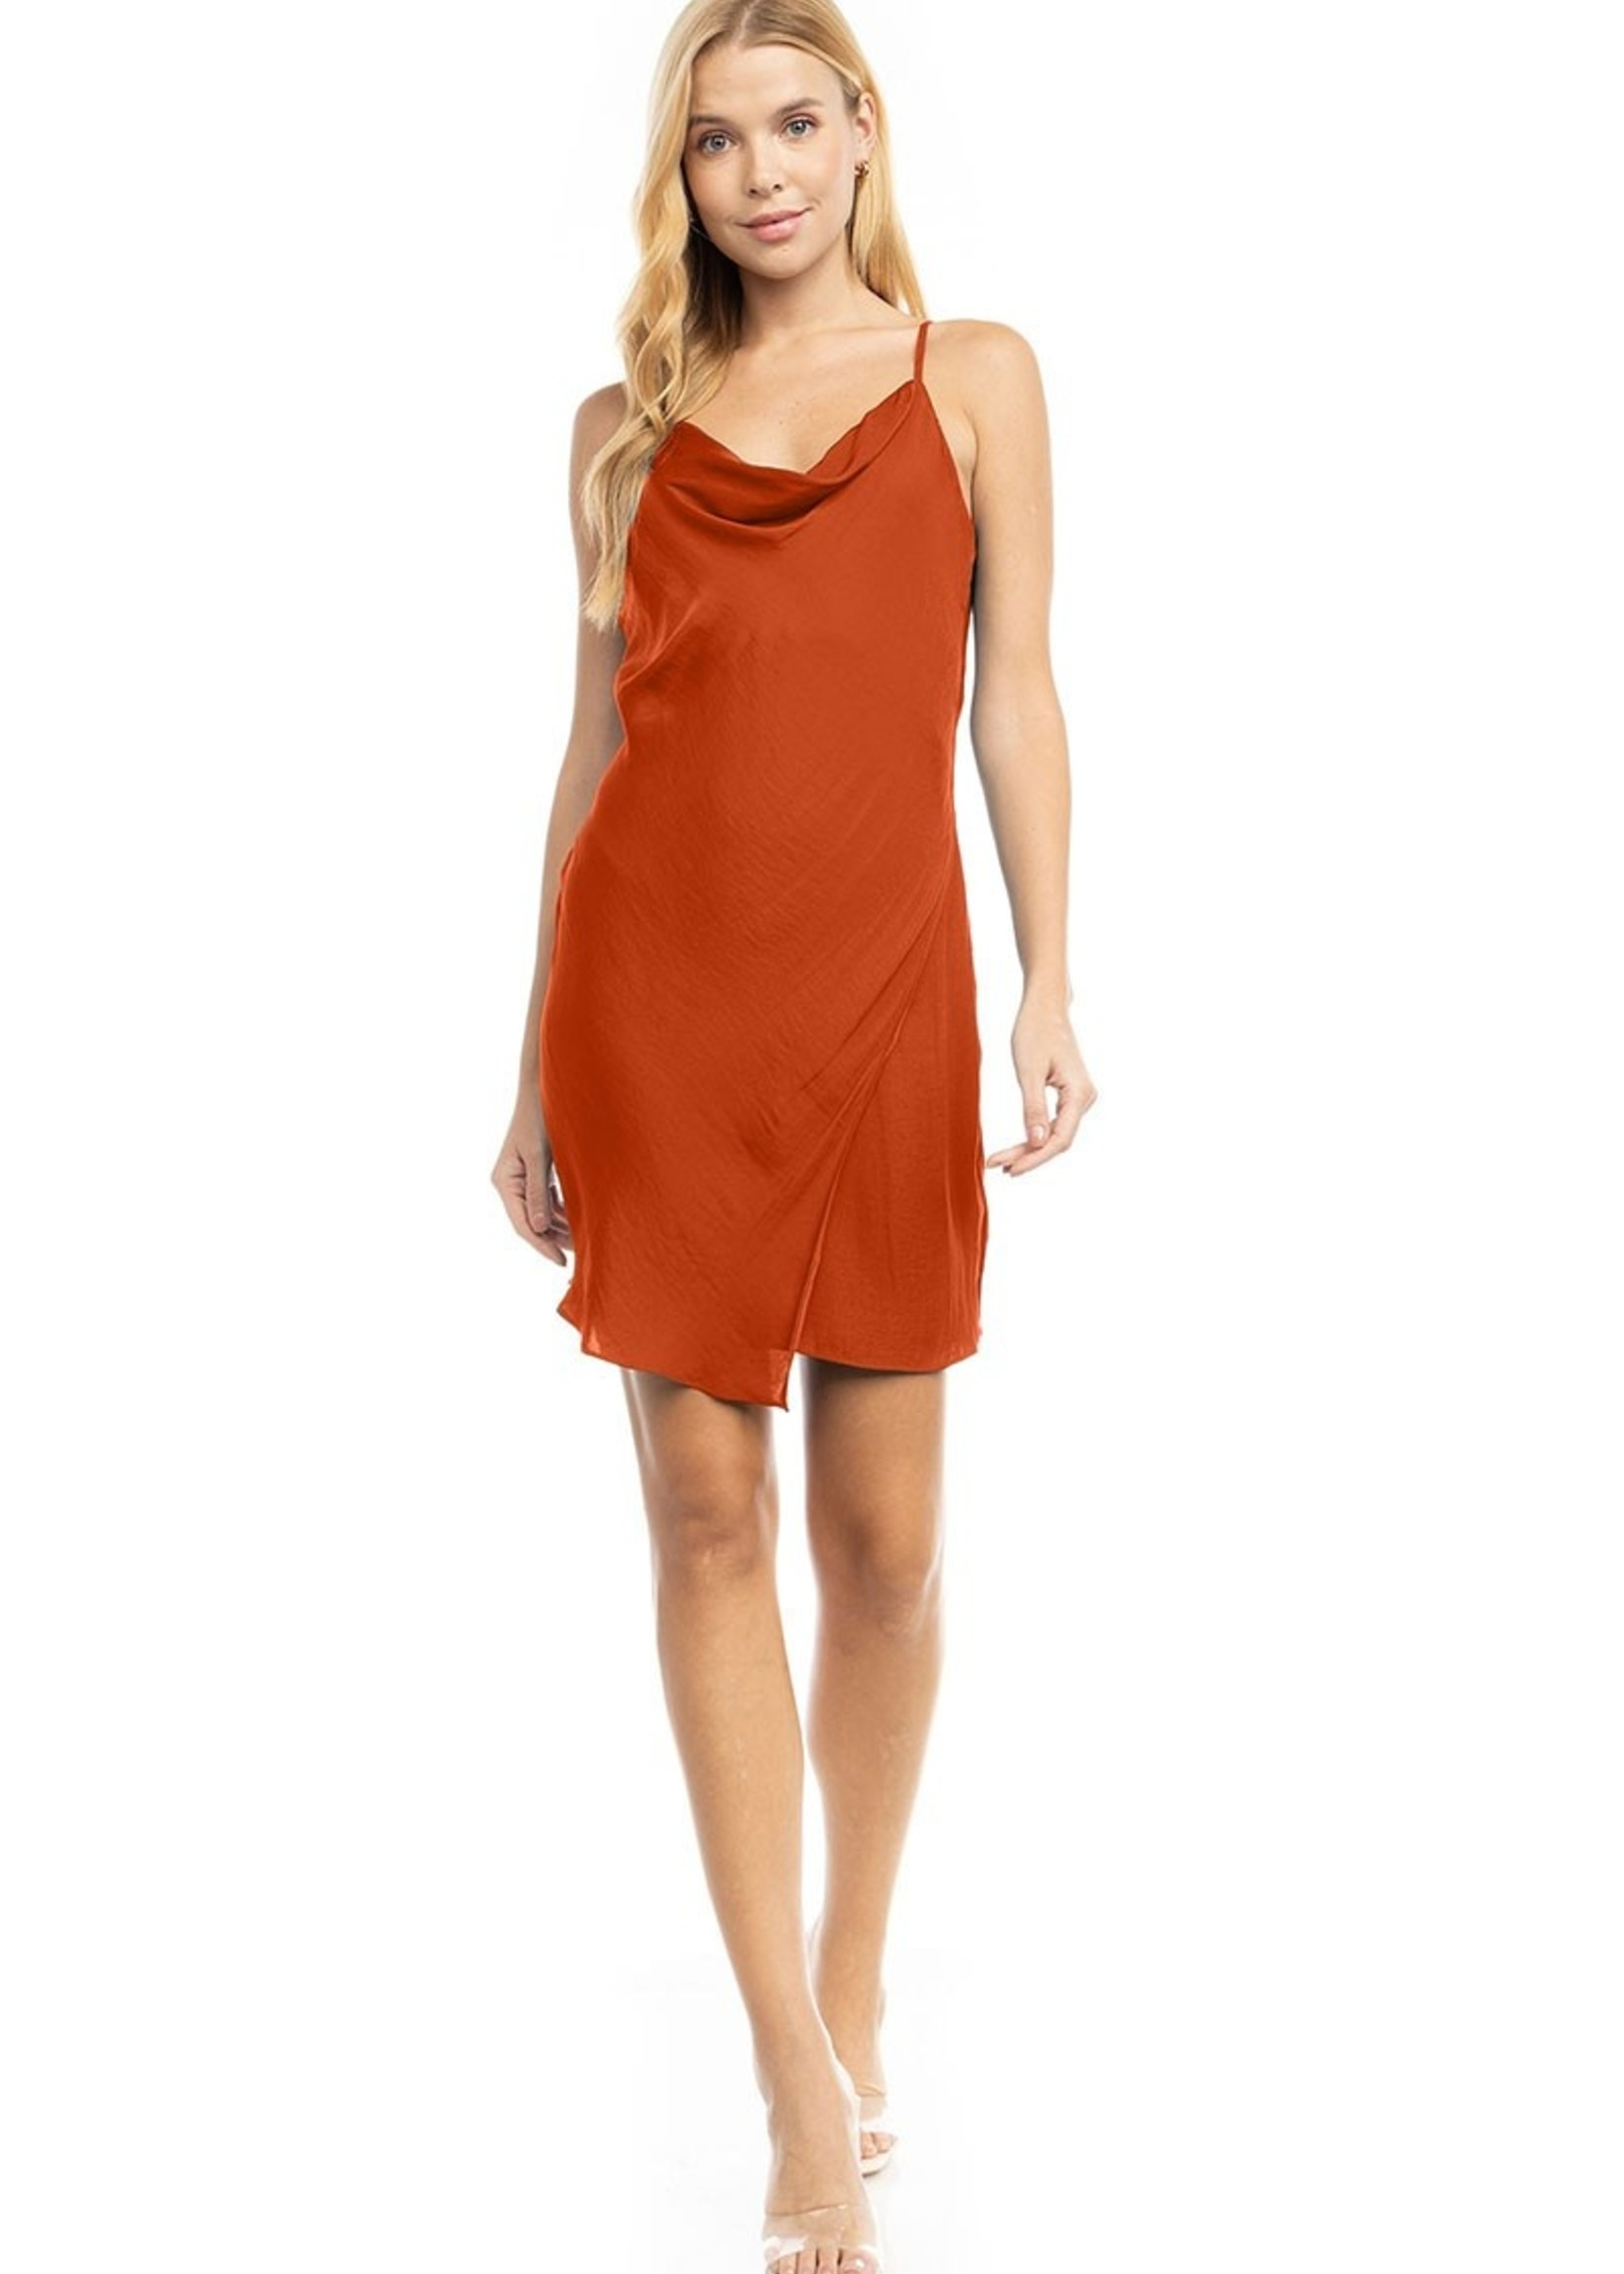 Cowl Neck Dress - Copper